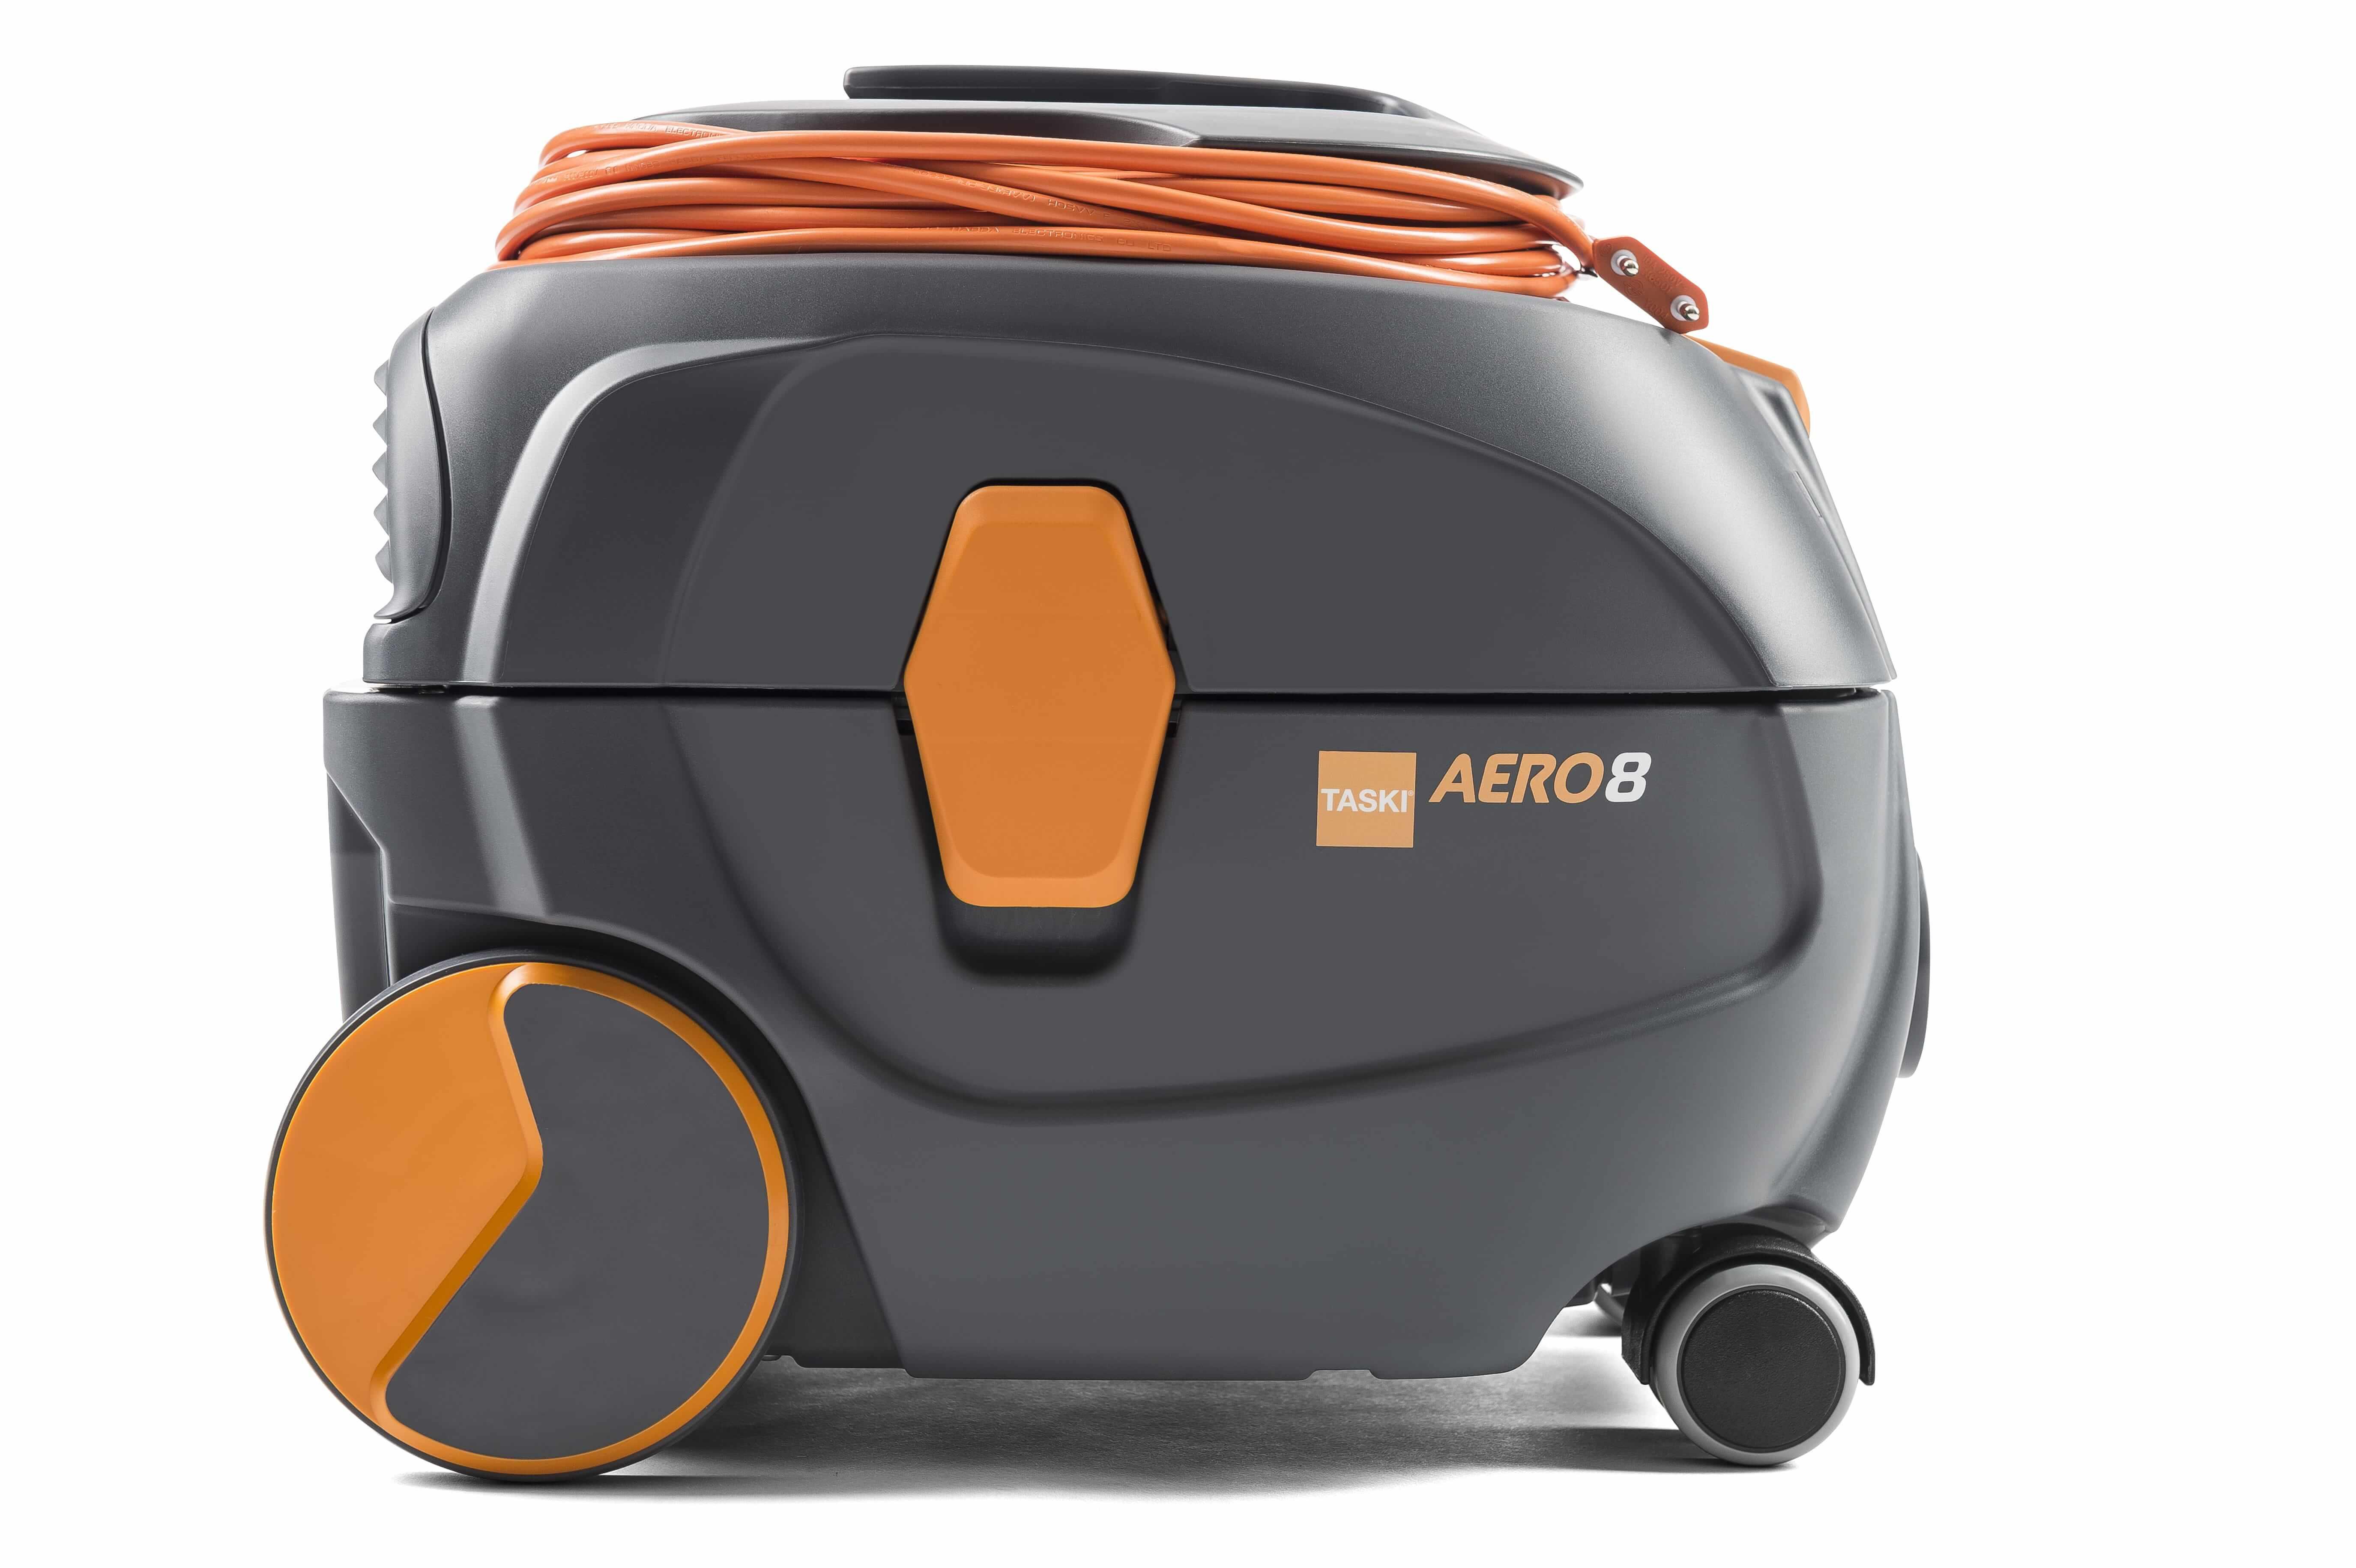 Taski Aero 8